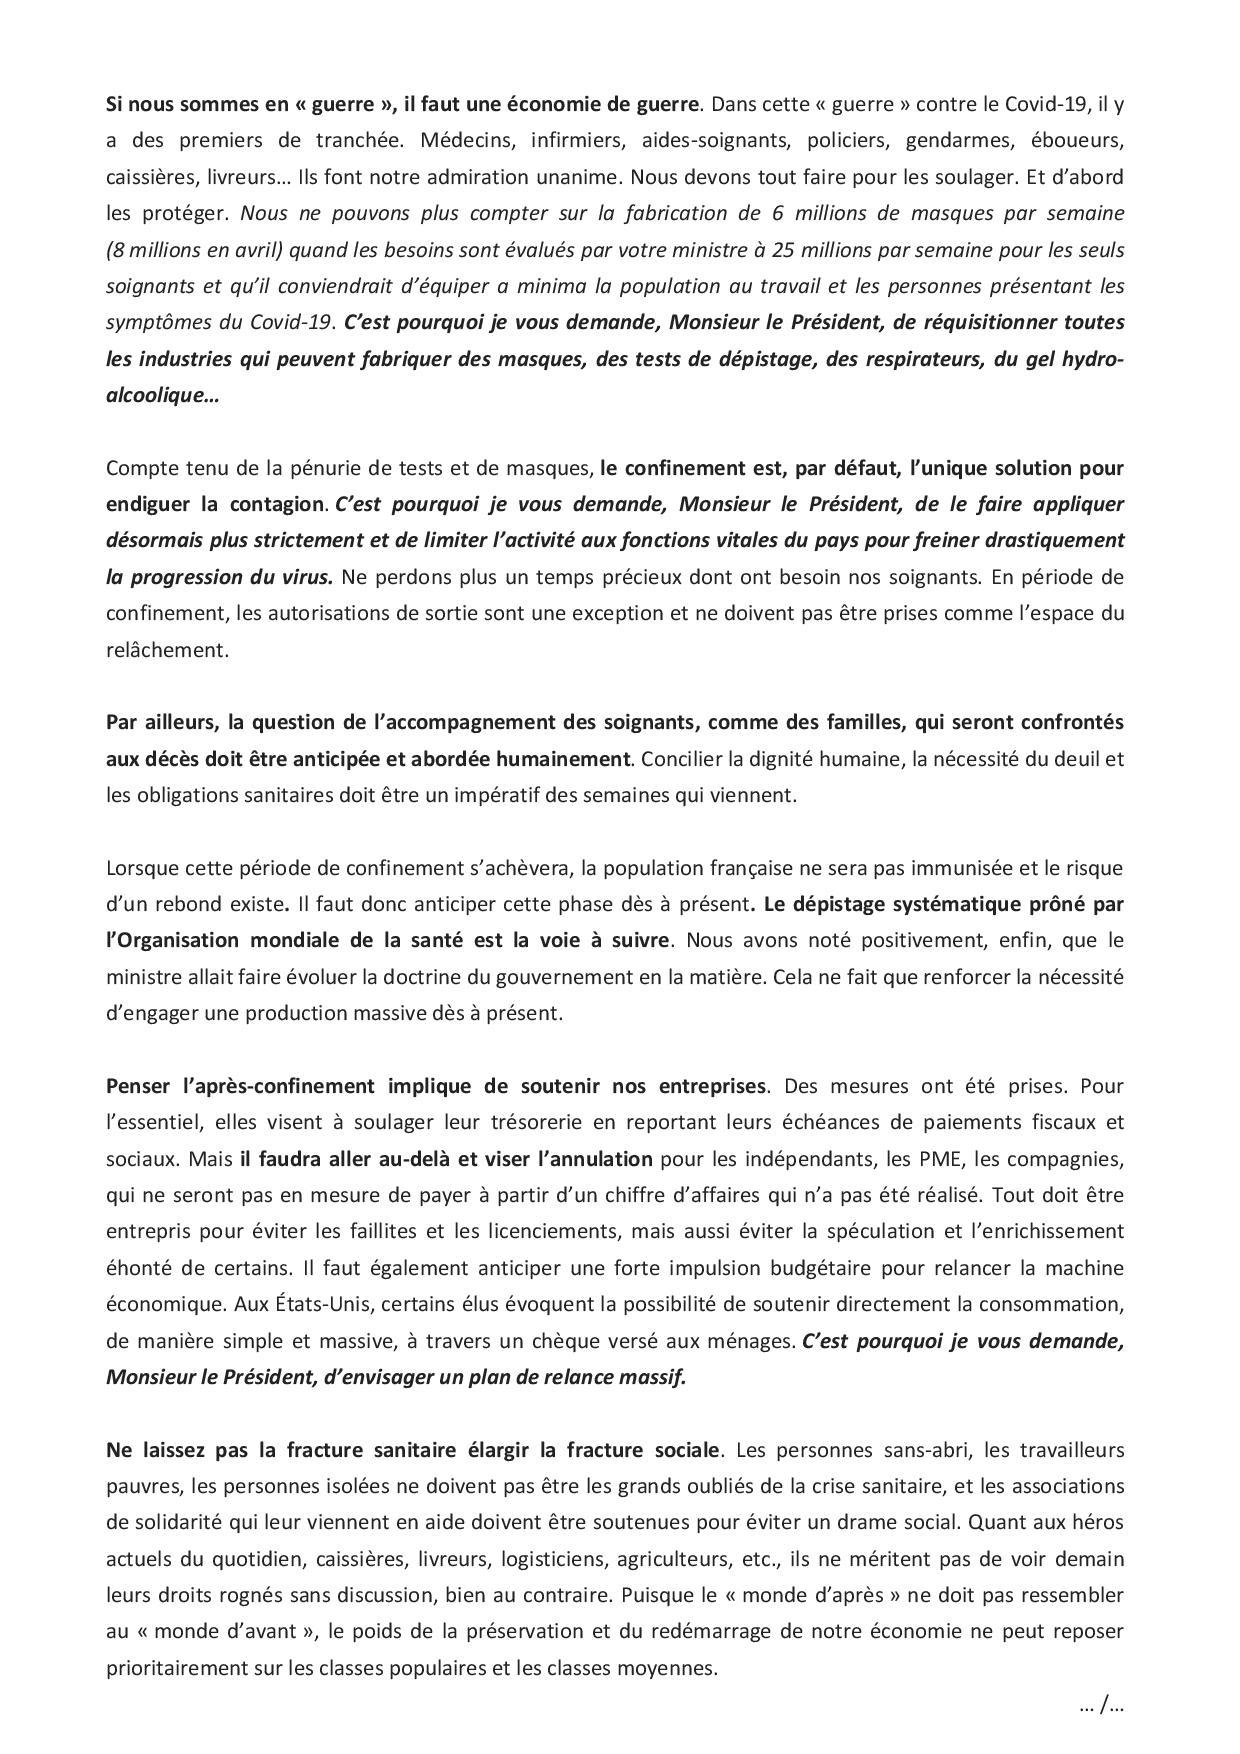 THÉORISATION COMMUNISTE PAR TEMPS DE CORONAVIRUS ETun6NkXkAI7k6v?format=jpg&name=large